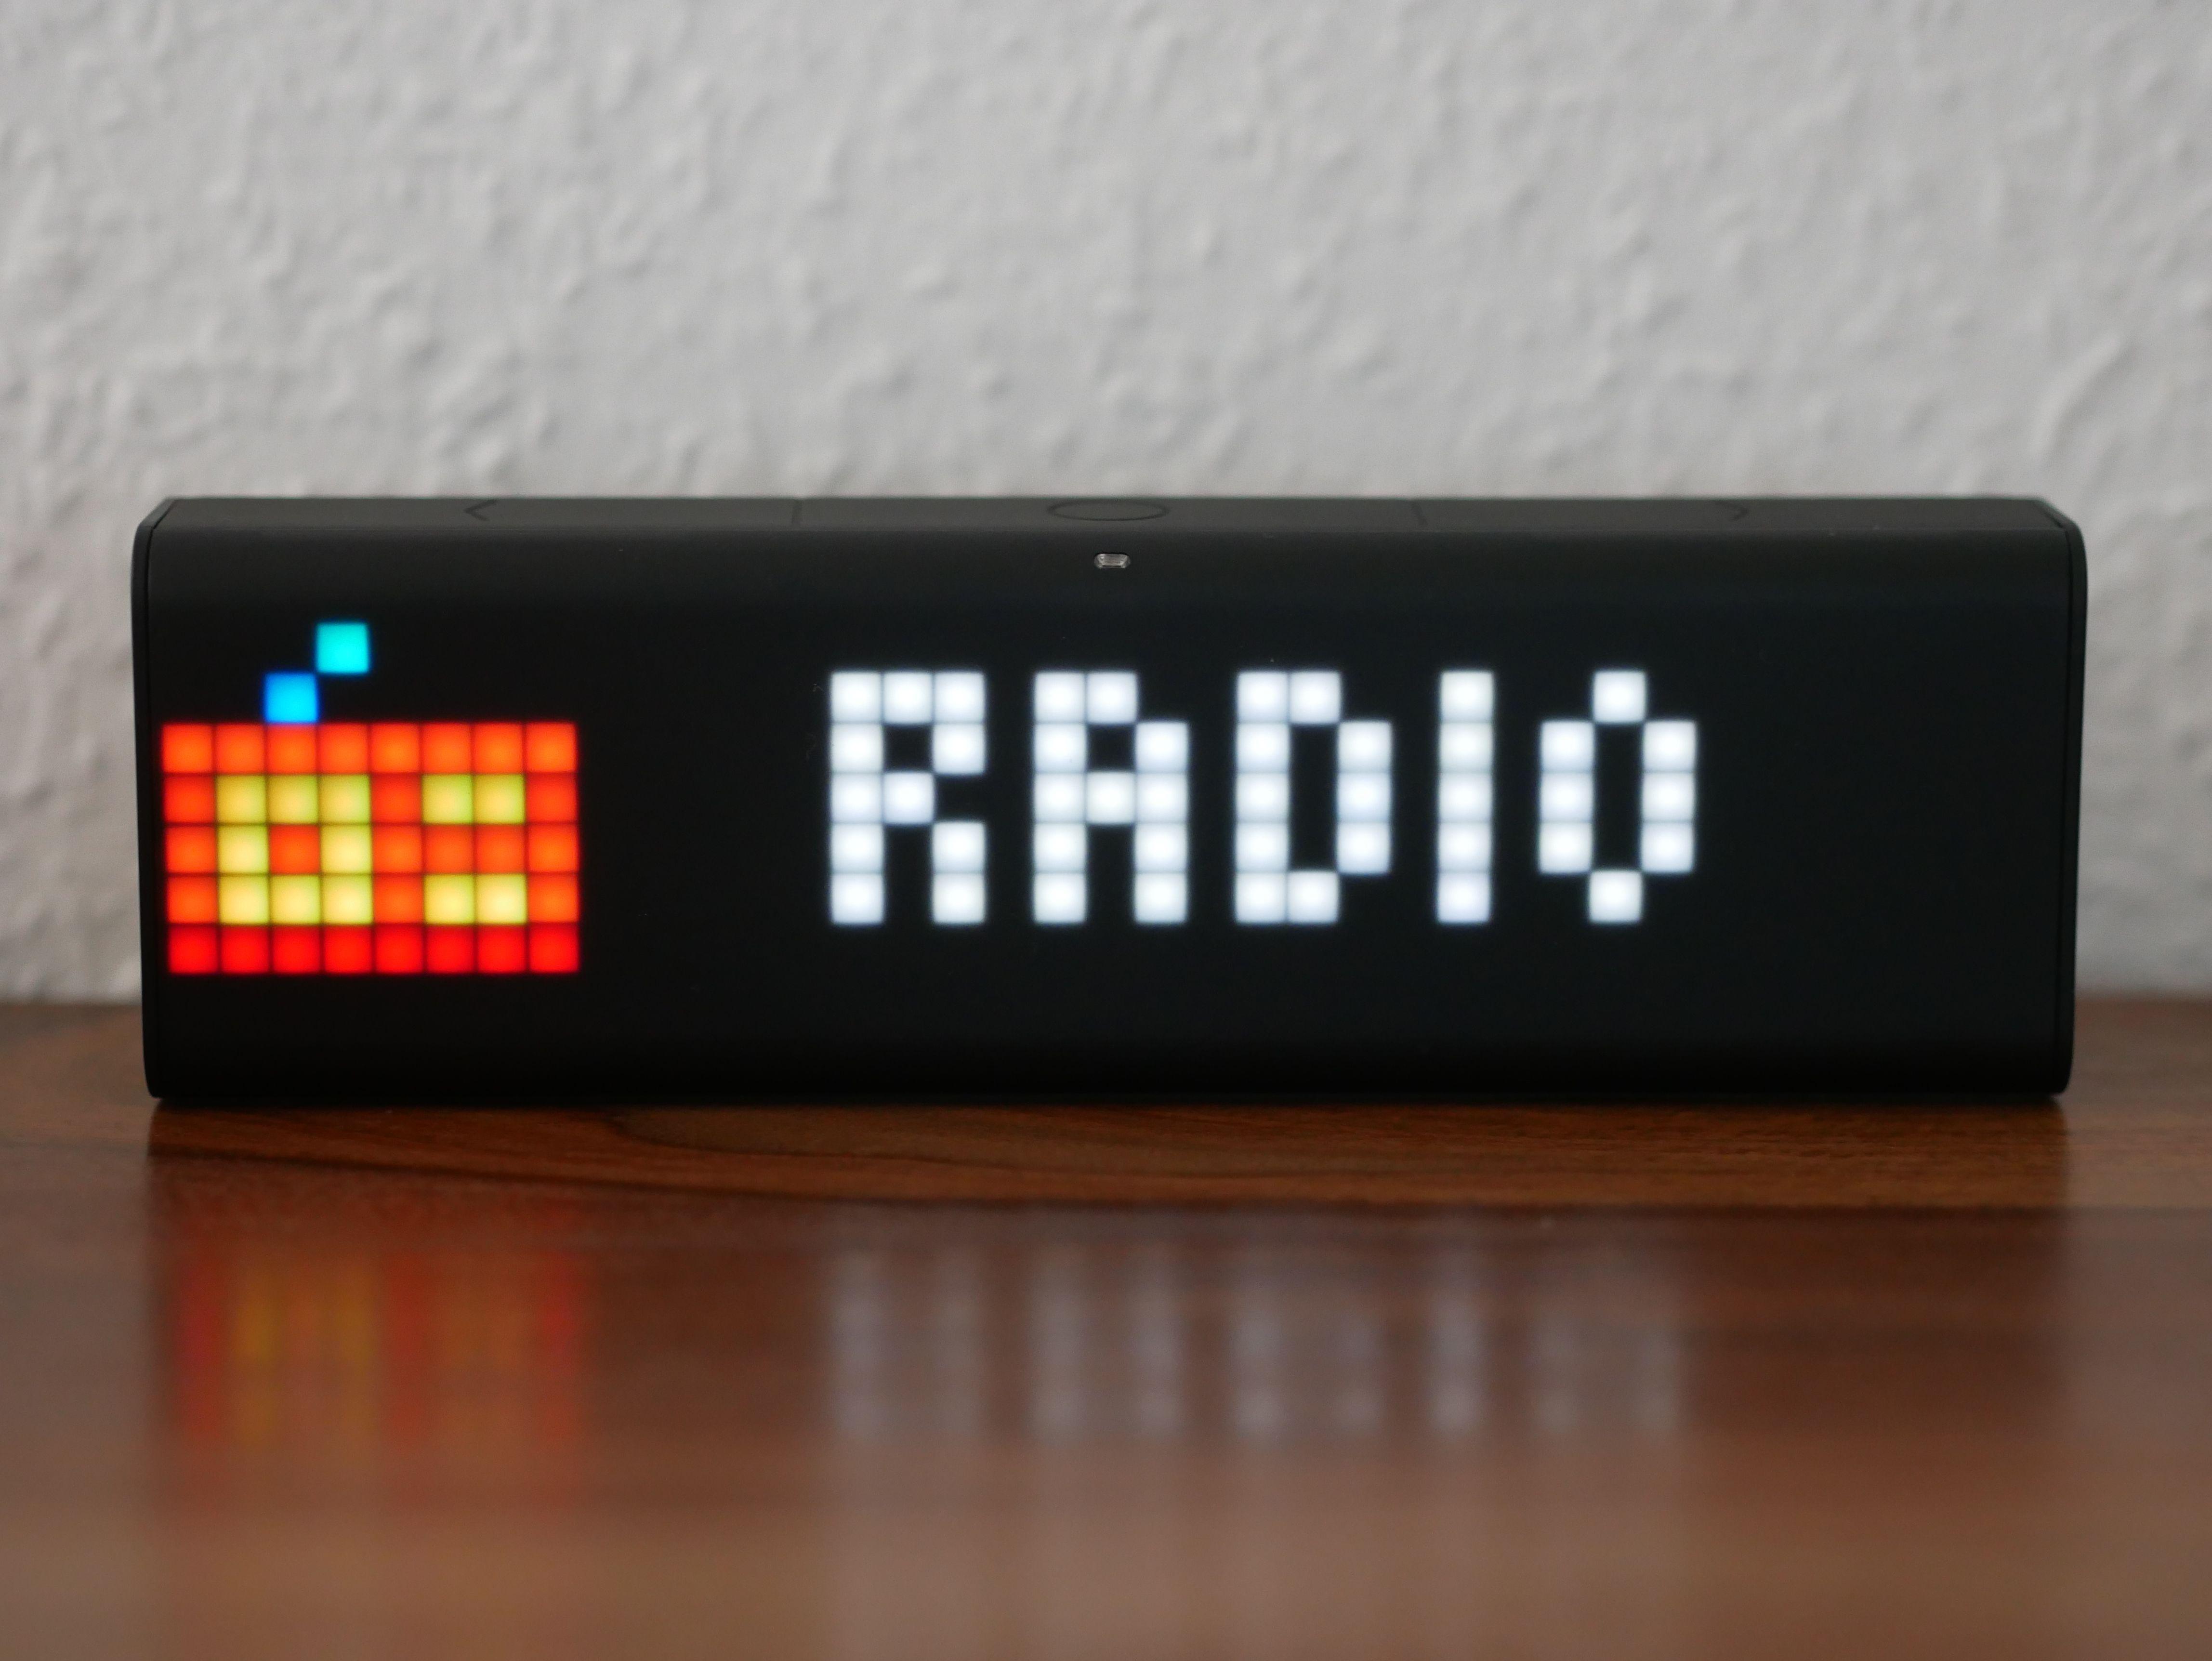 LaMetric Time: Smarte WLAN-Uhr / Internetwecker im Test: https://www.housecontrollers.de/allgemein/lametric-time-test-wlan-uhr/